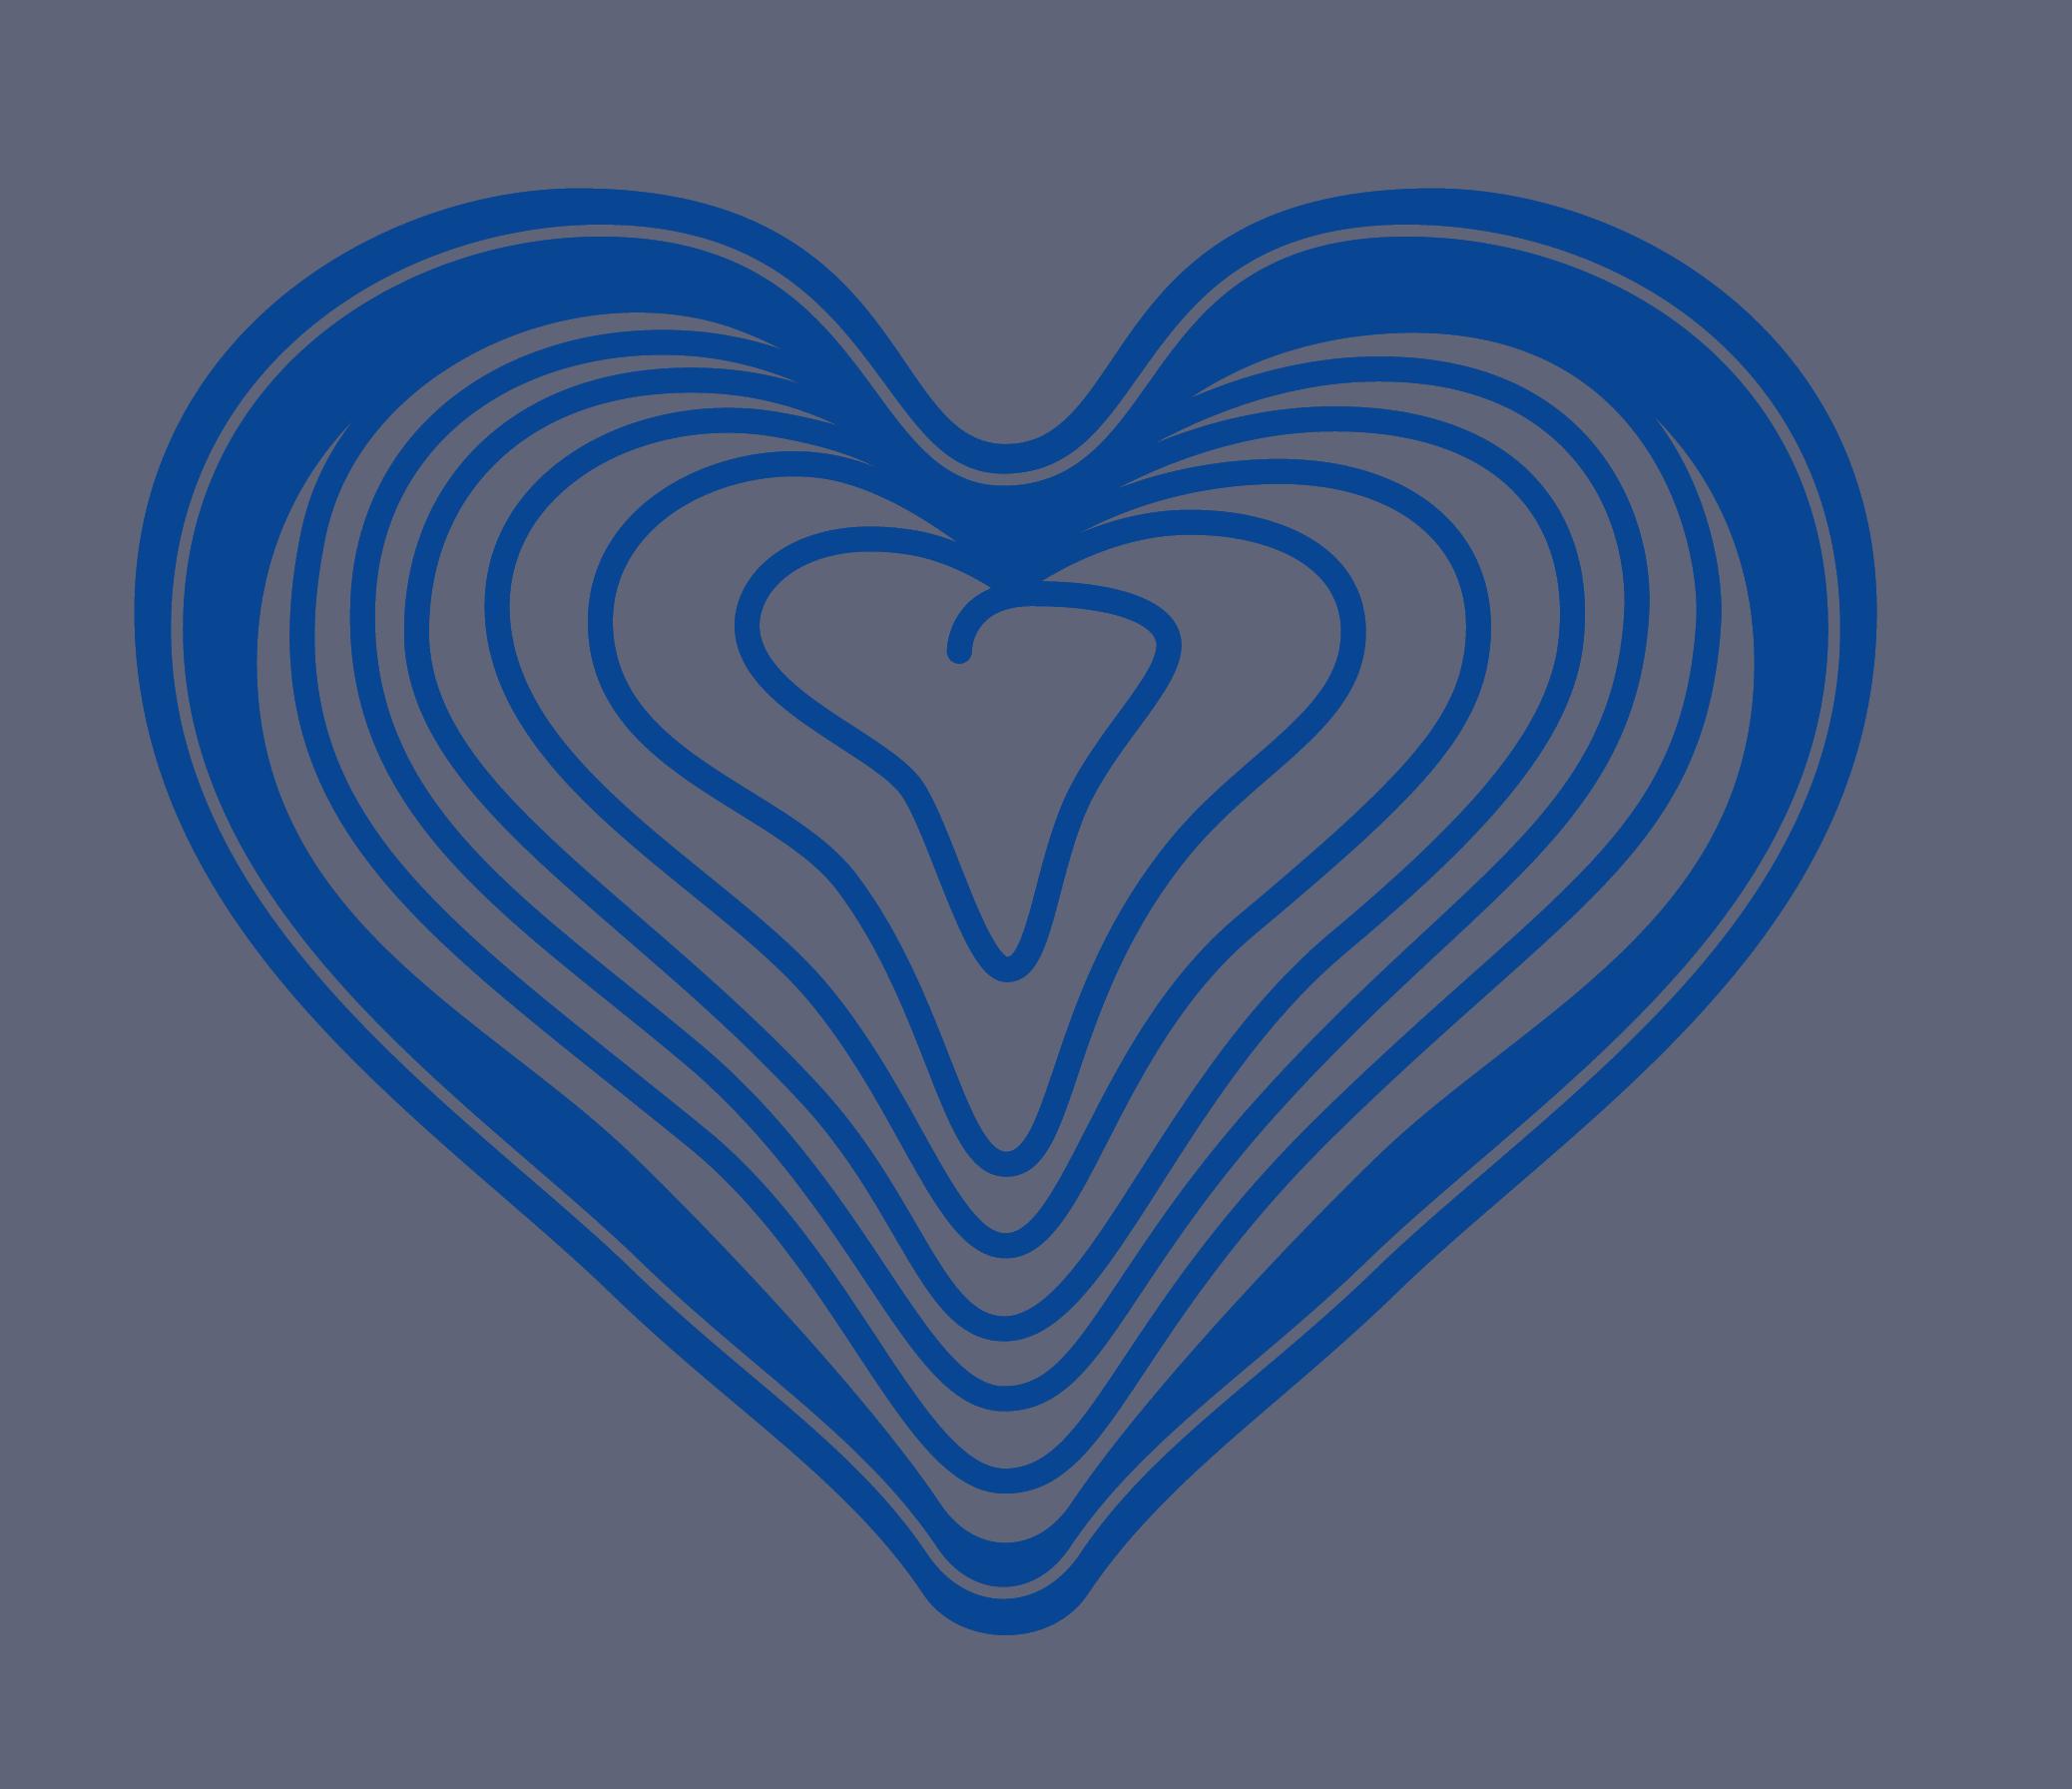 Genetesis-heart-logo